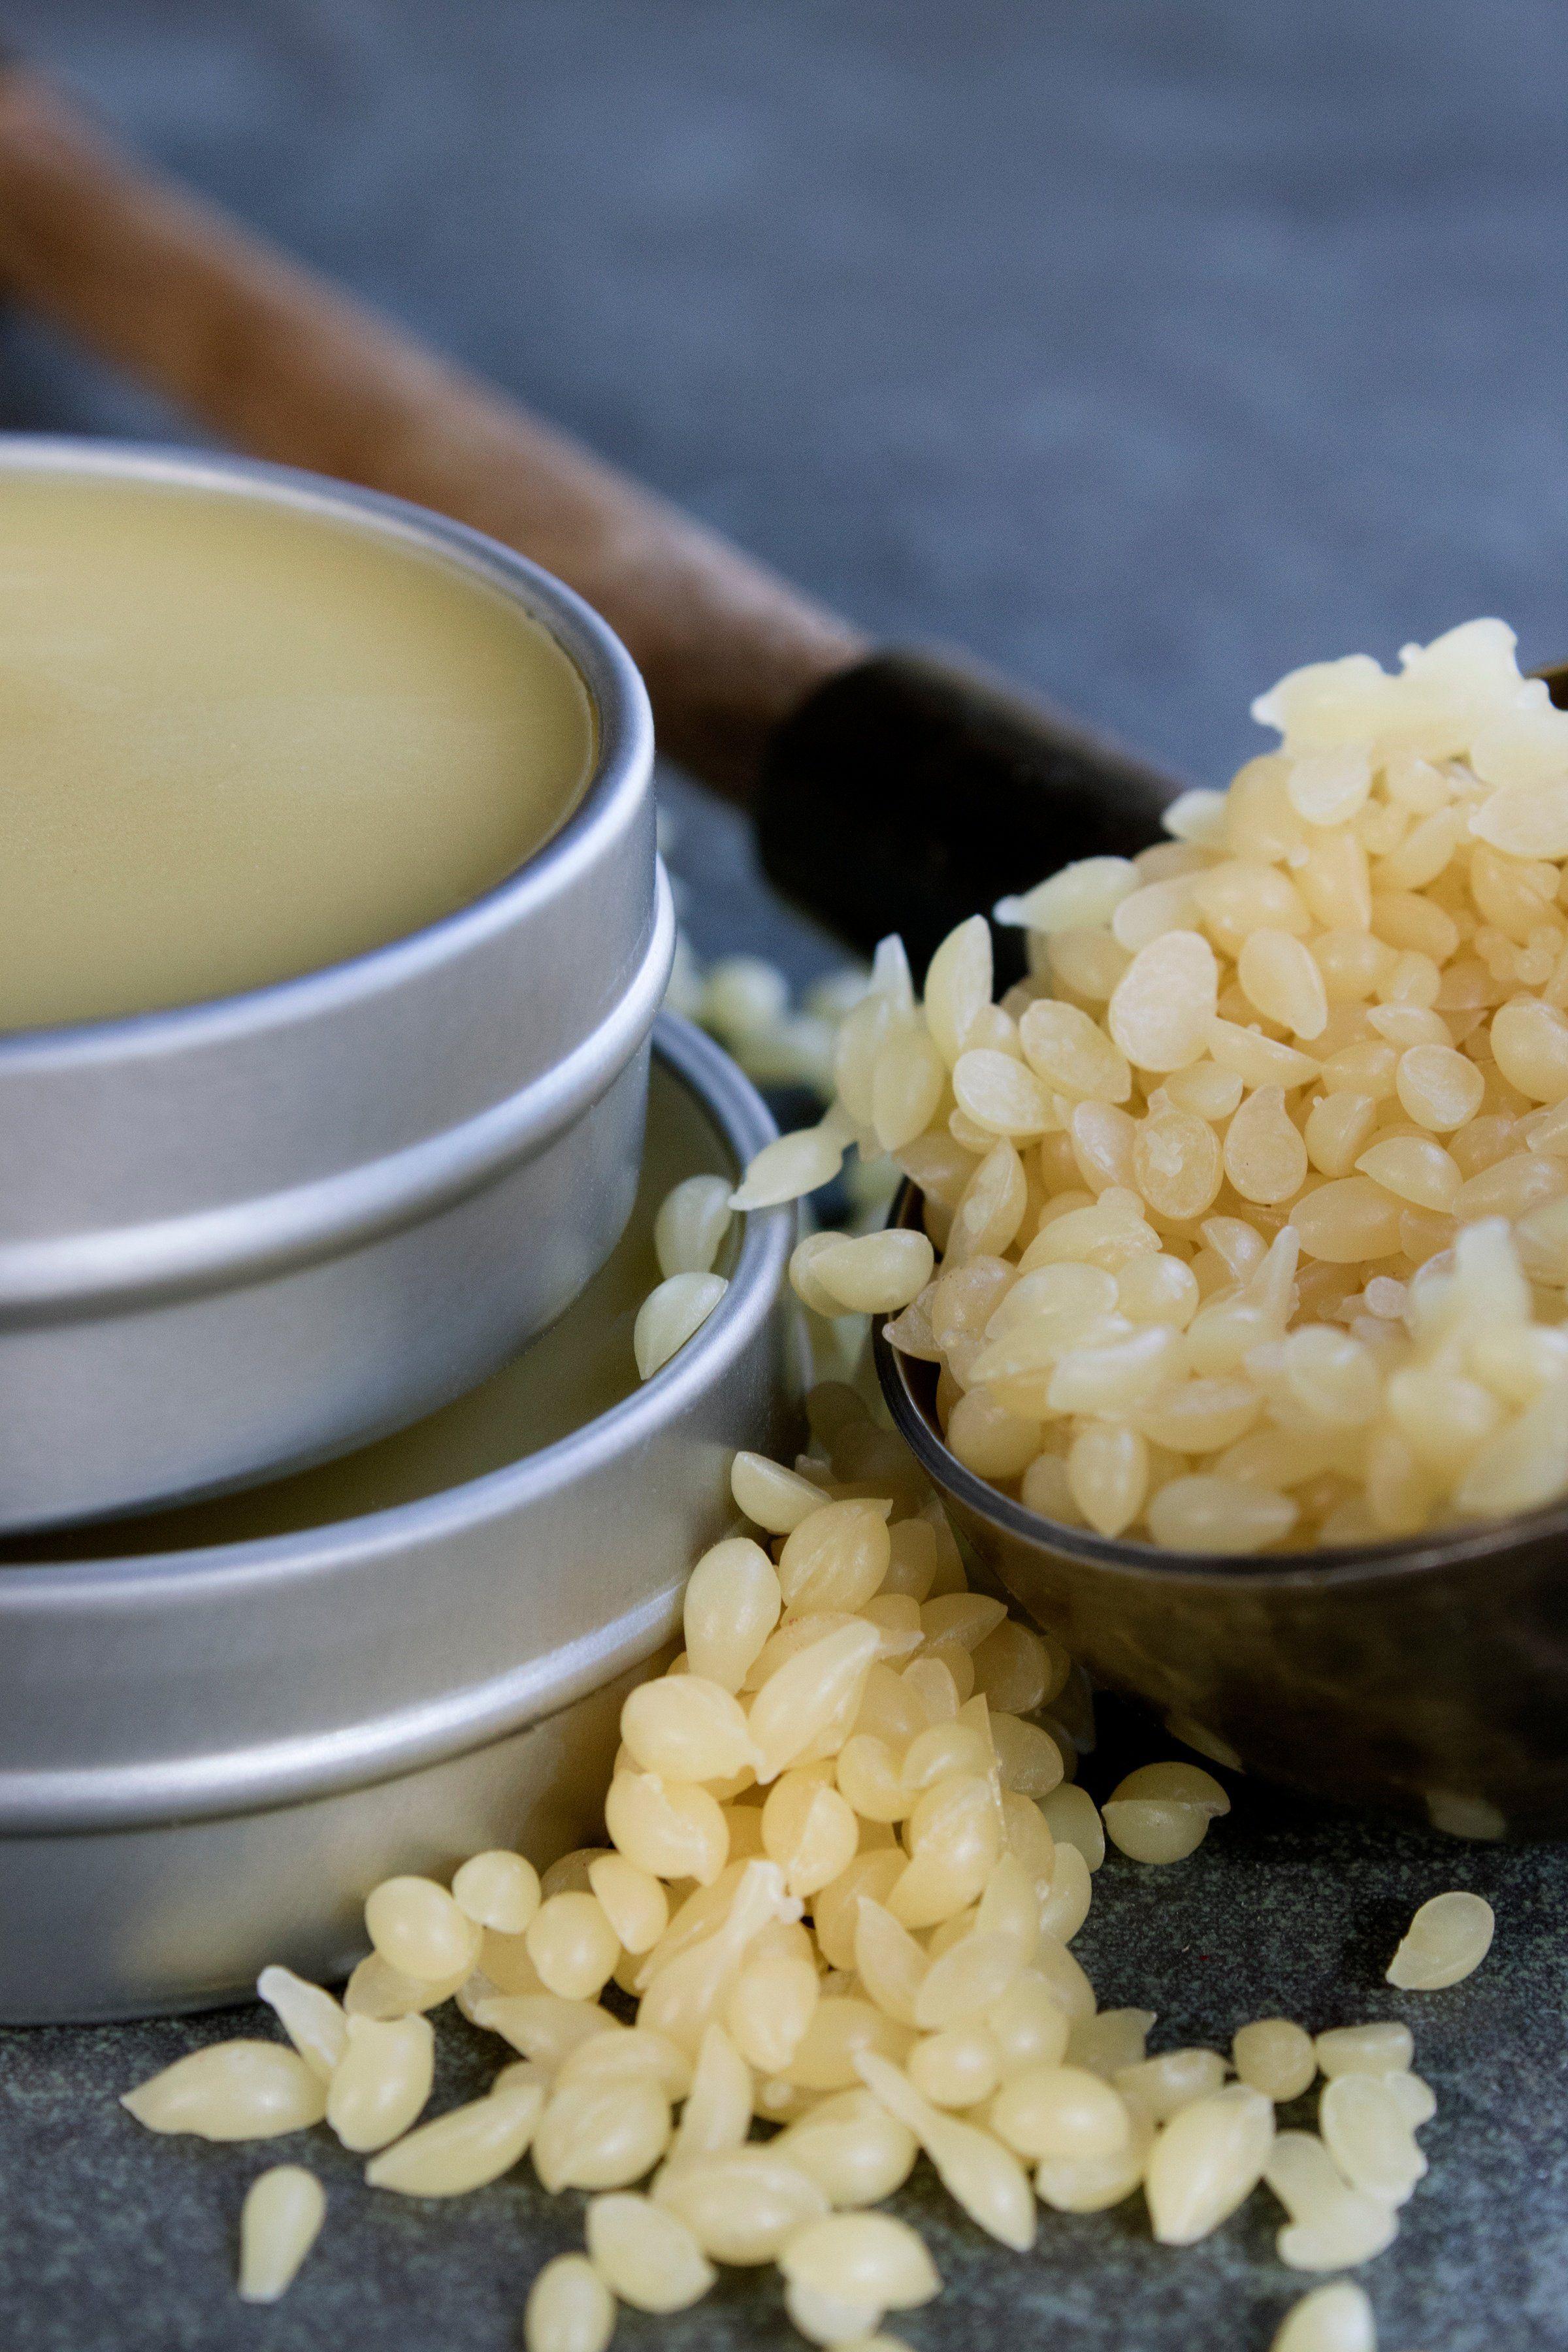 Diy cuticle oil for natural nail care recipe natural